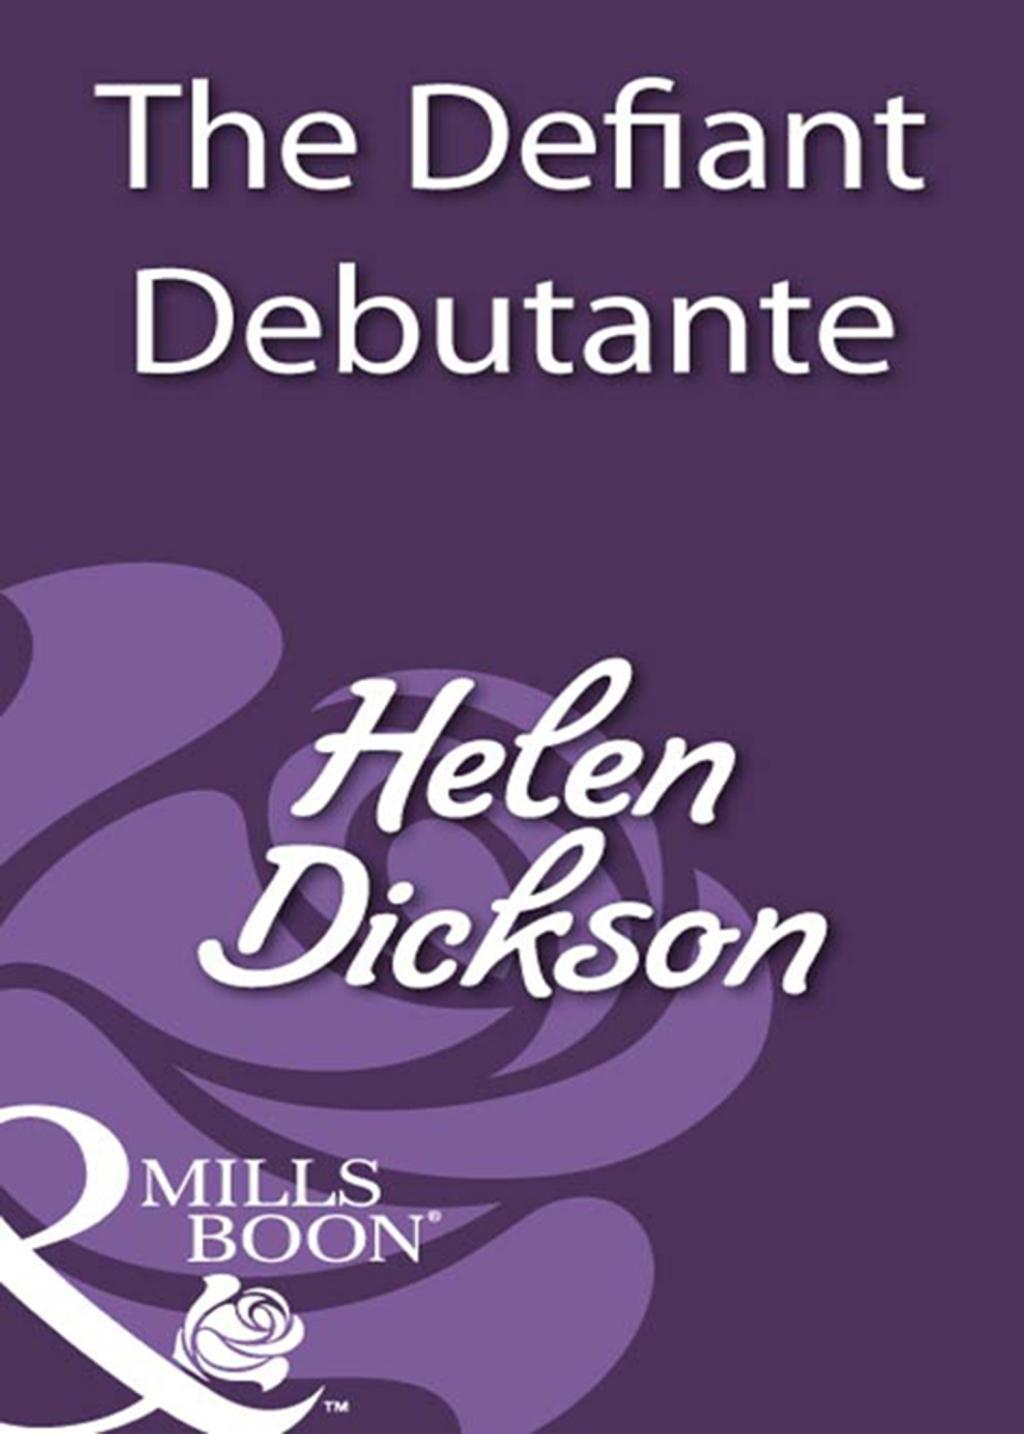 The Defiant Debutante (Mills & Boon Historical)